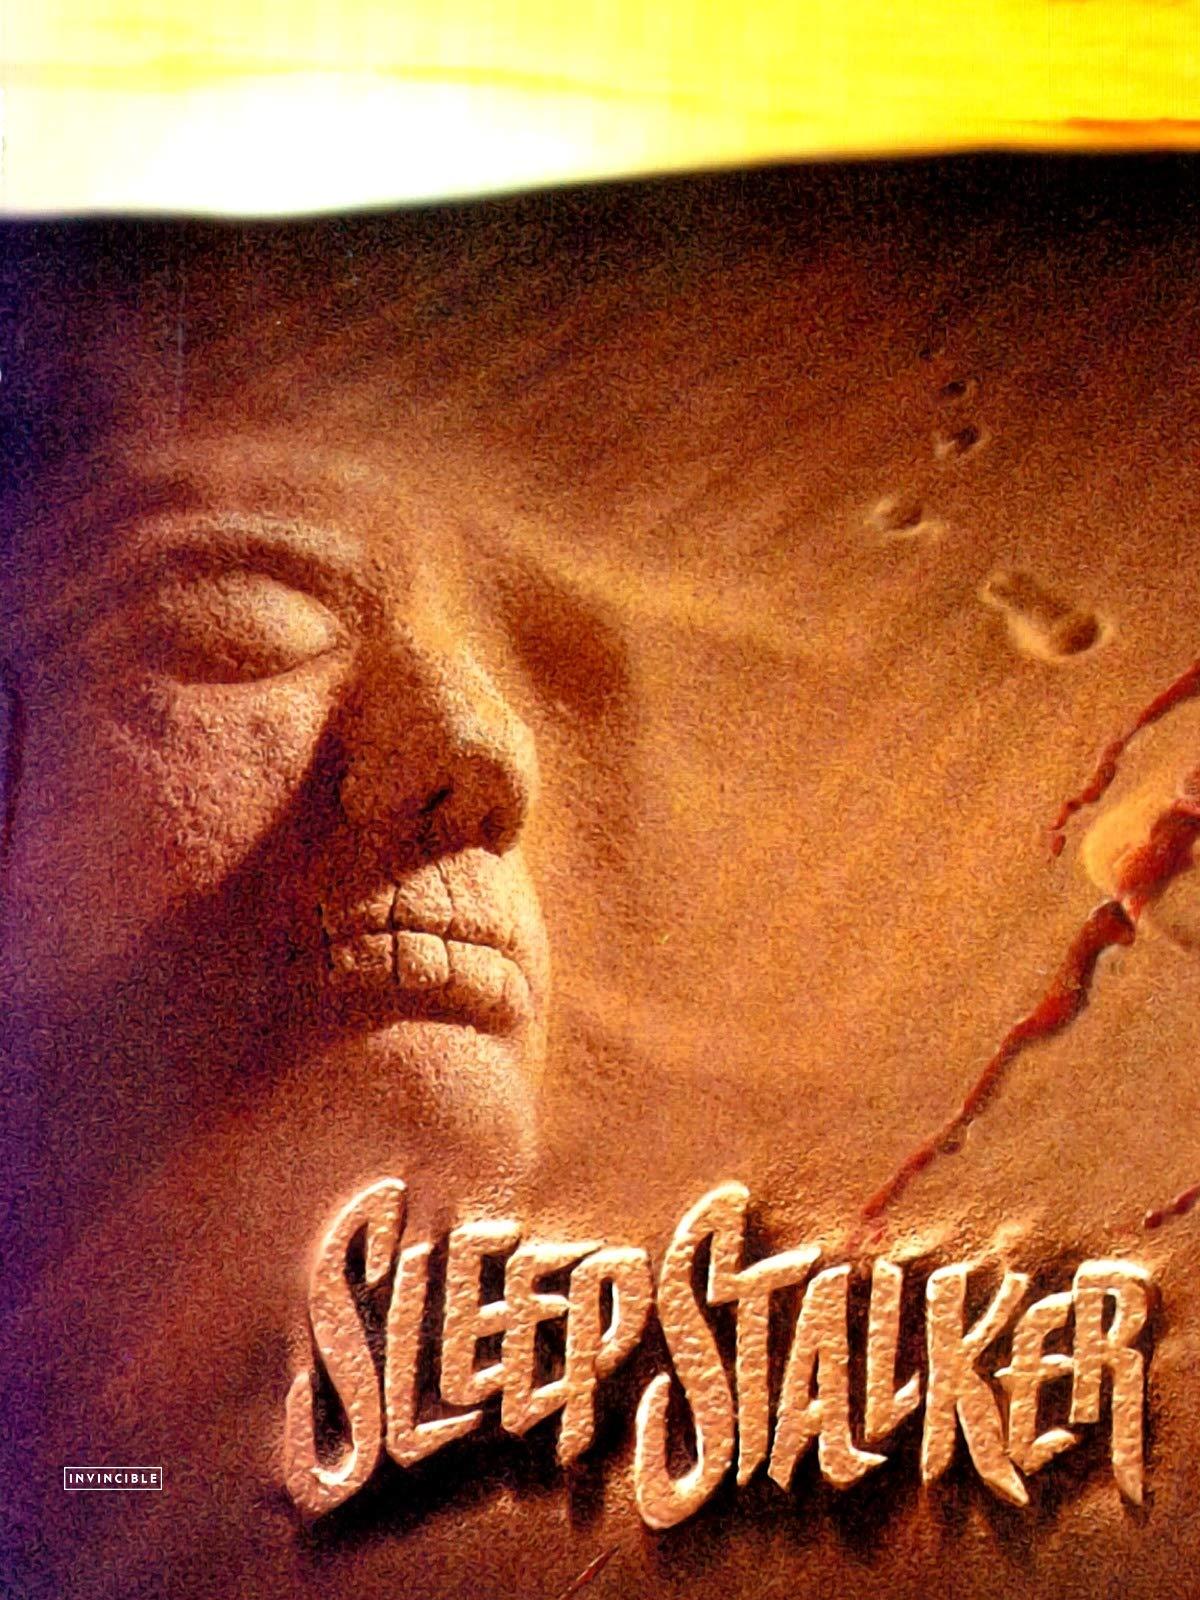 Sleepstalker on Amazon Prime Video UK